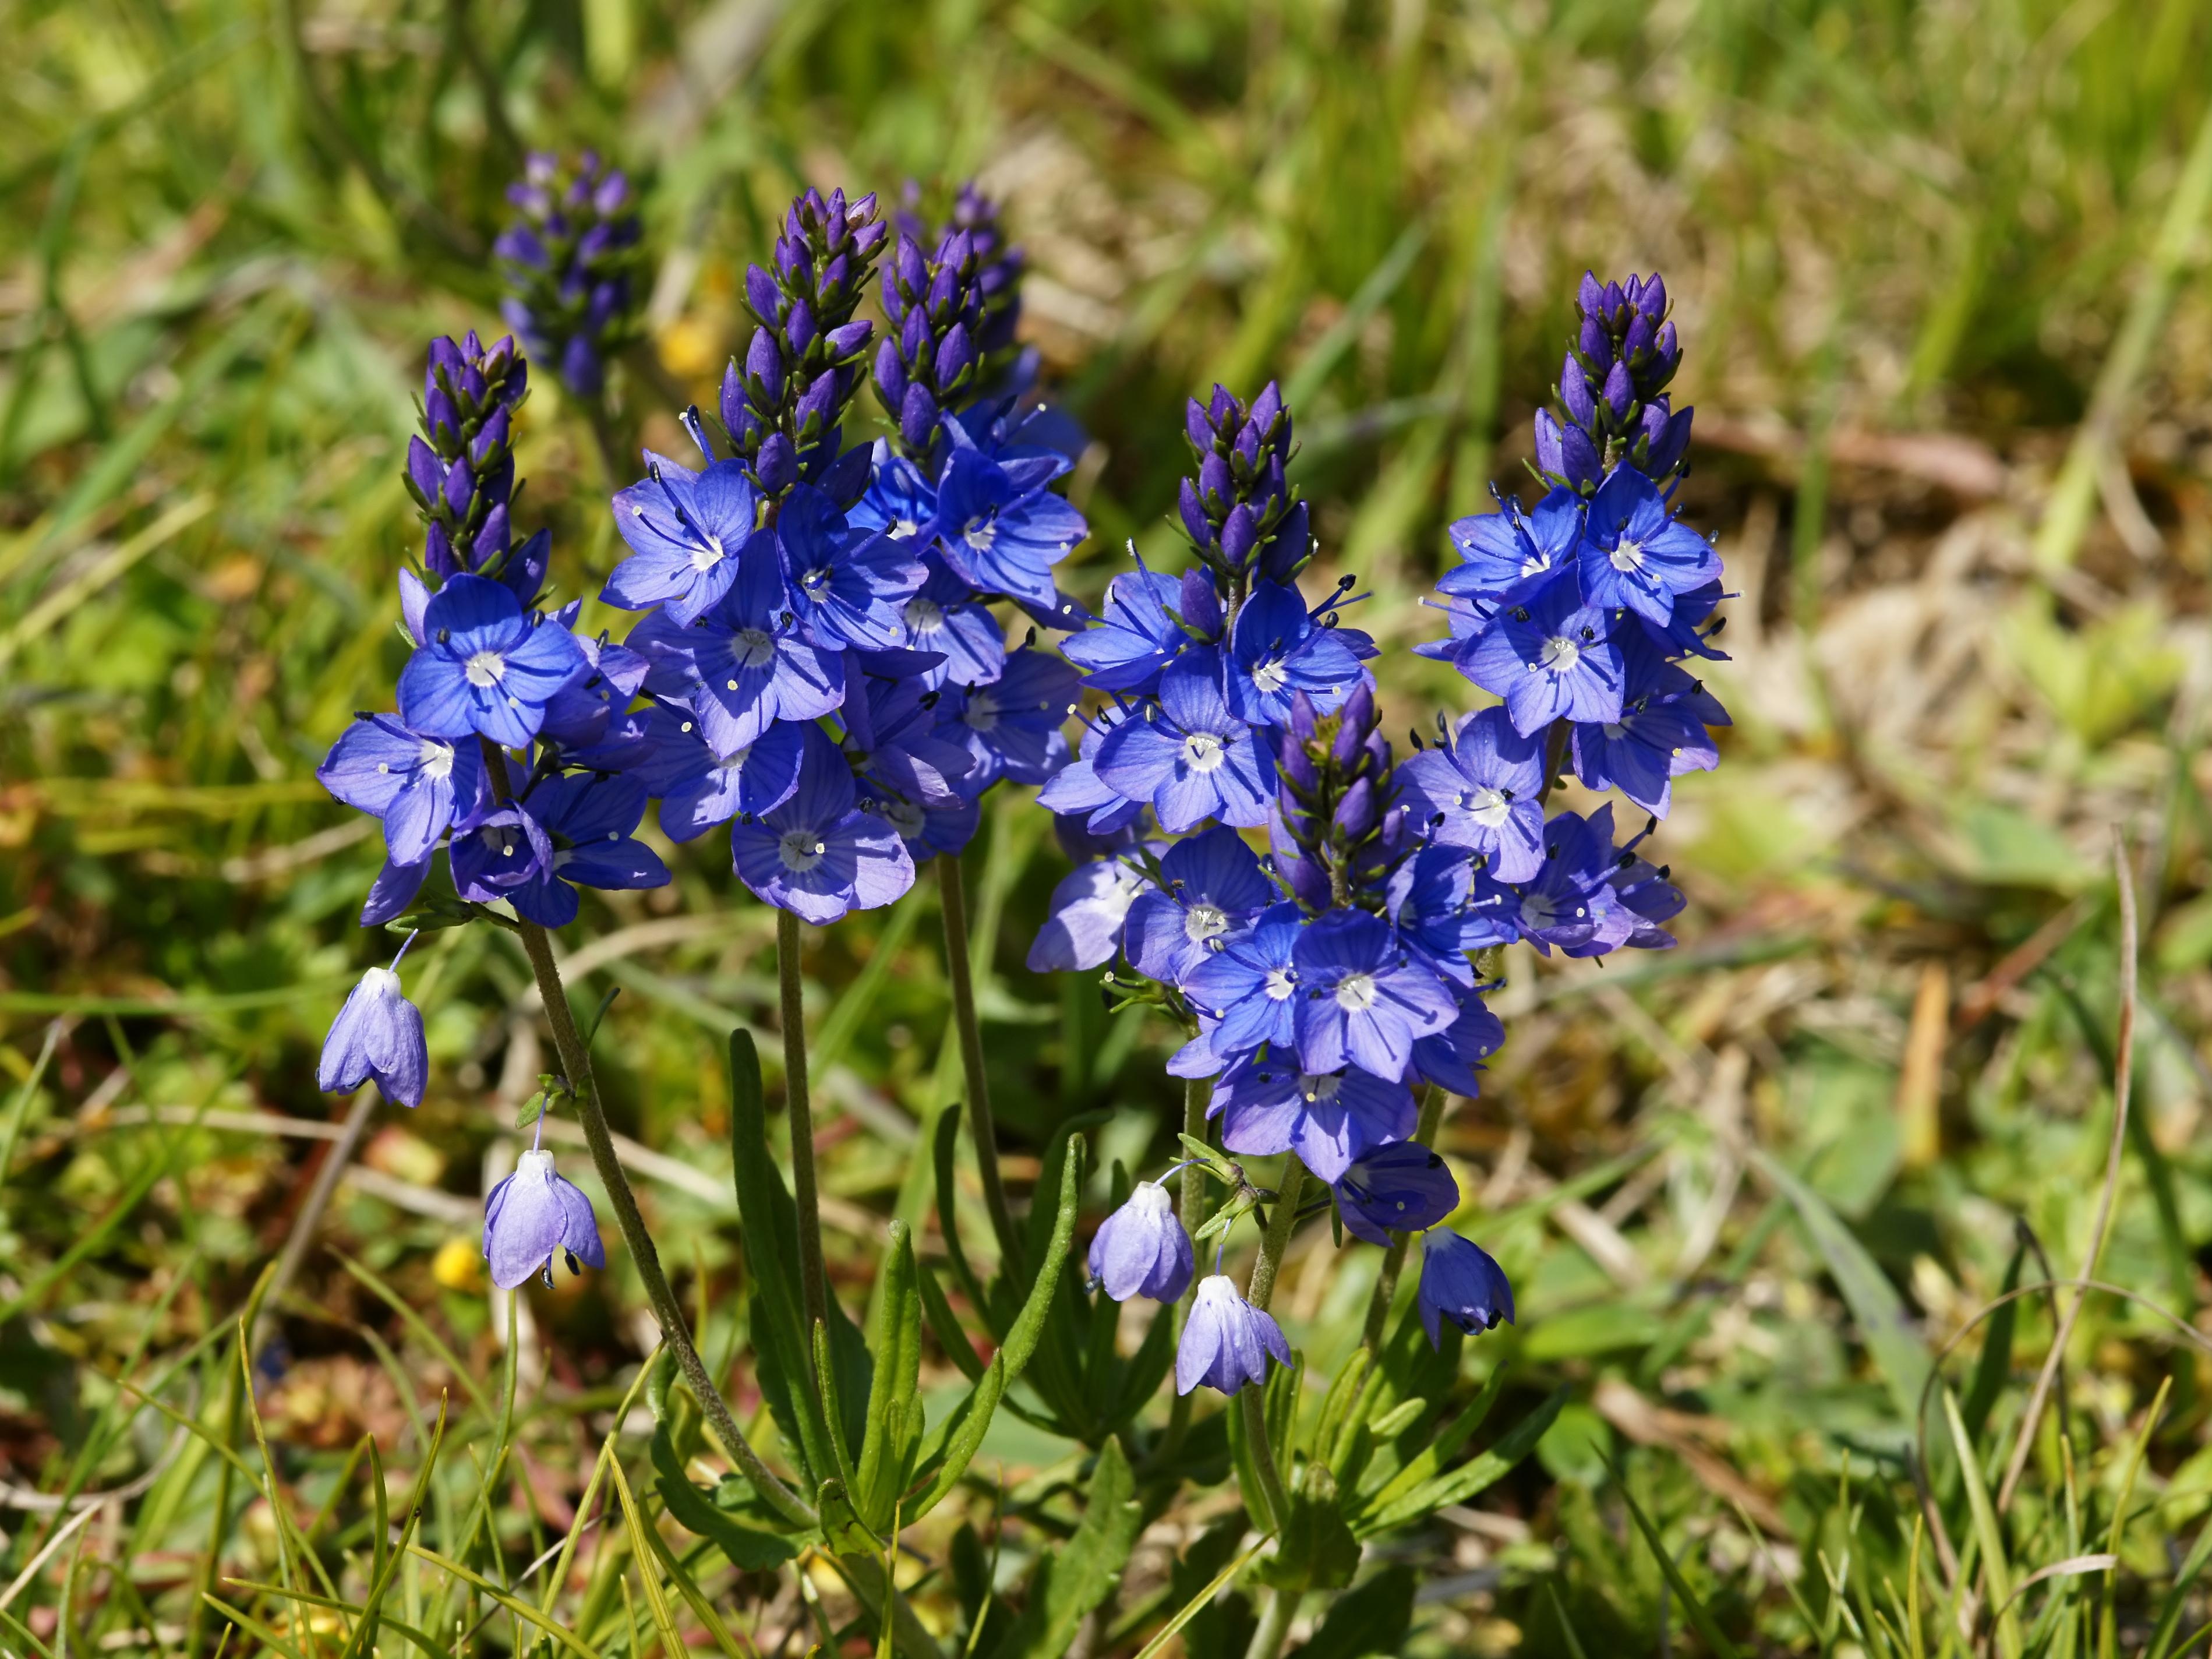 https://upload.wikimedia.org/wikipedia/commons/5/55/Veronica_prostrata_subsp._scheereri_(plant).jpg